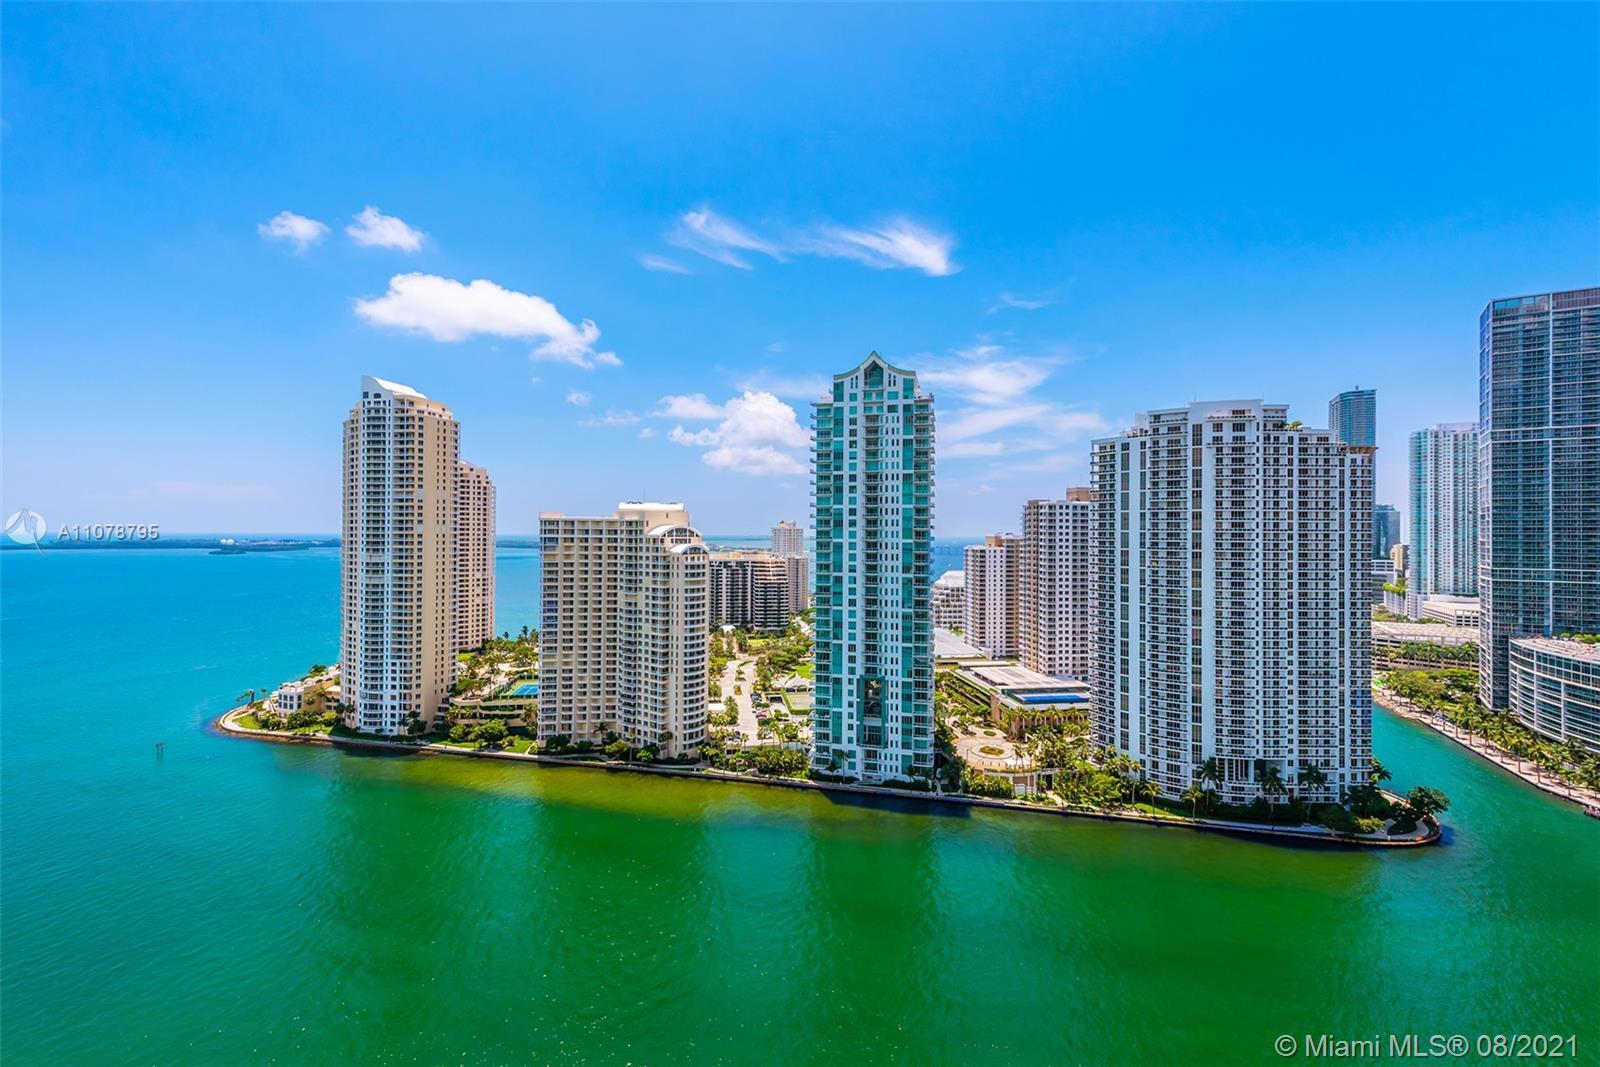 One Miami West #3021 - 325 S Biscayne Blvd #3021, Miami, FL 33131